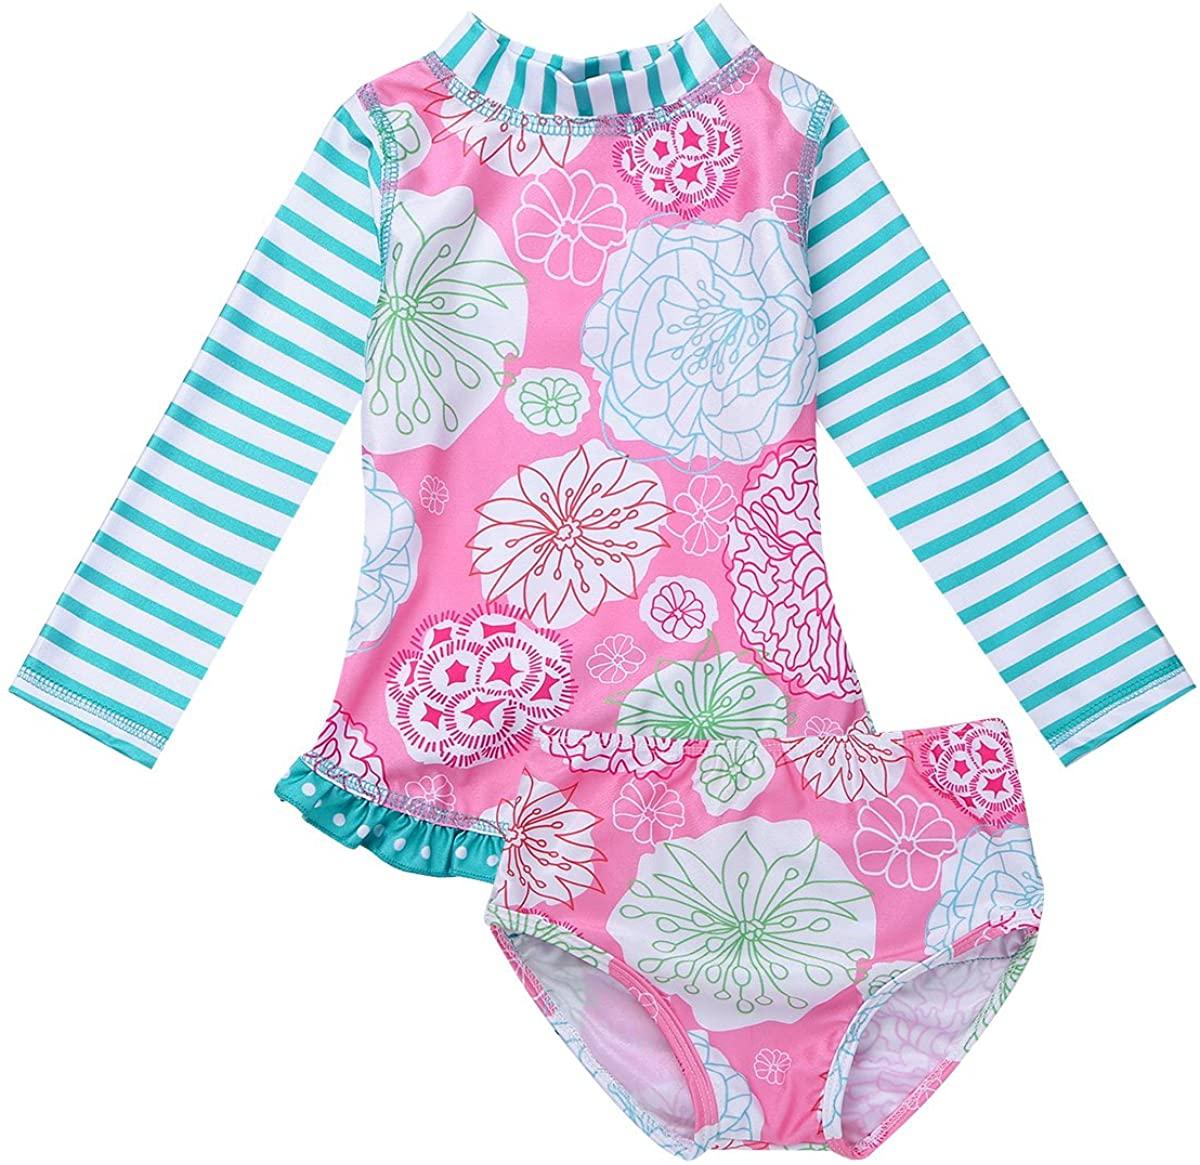 TiaoBug Kids Girls Separates Two-Piece Long Sleeves Rash Guard Sun Protection Swimsuit Swimwear Wetsuit UPF 50+